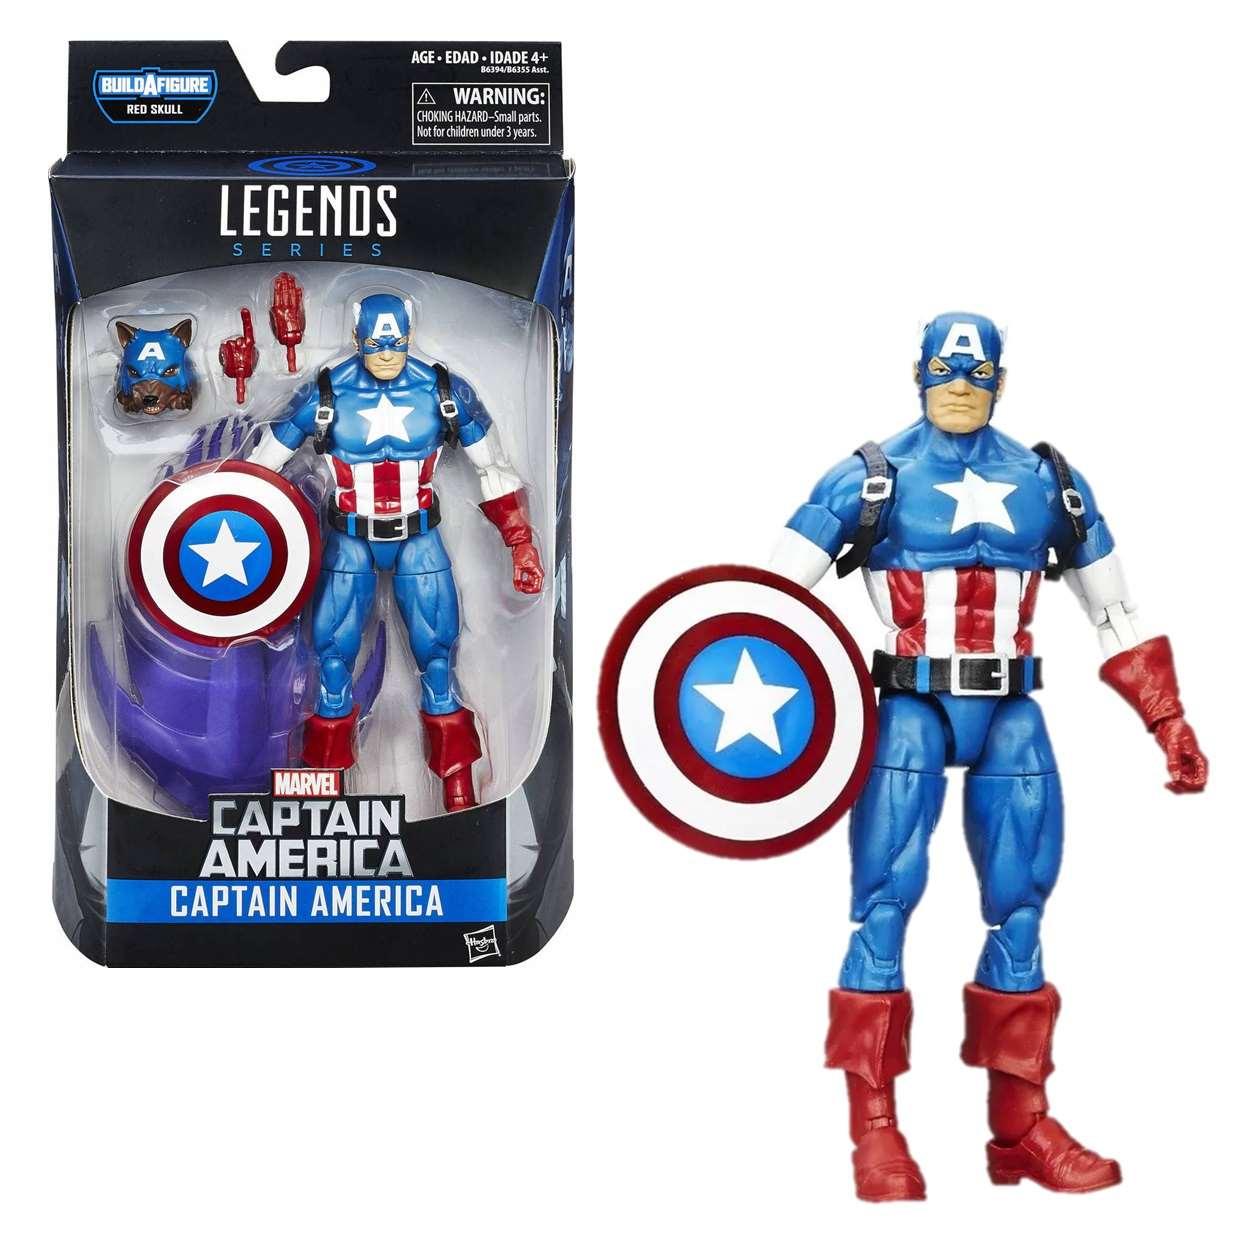 Capitán América Figura Marvel B A F Red Skull Legends 6 PuLG